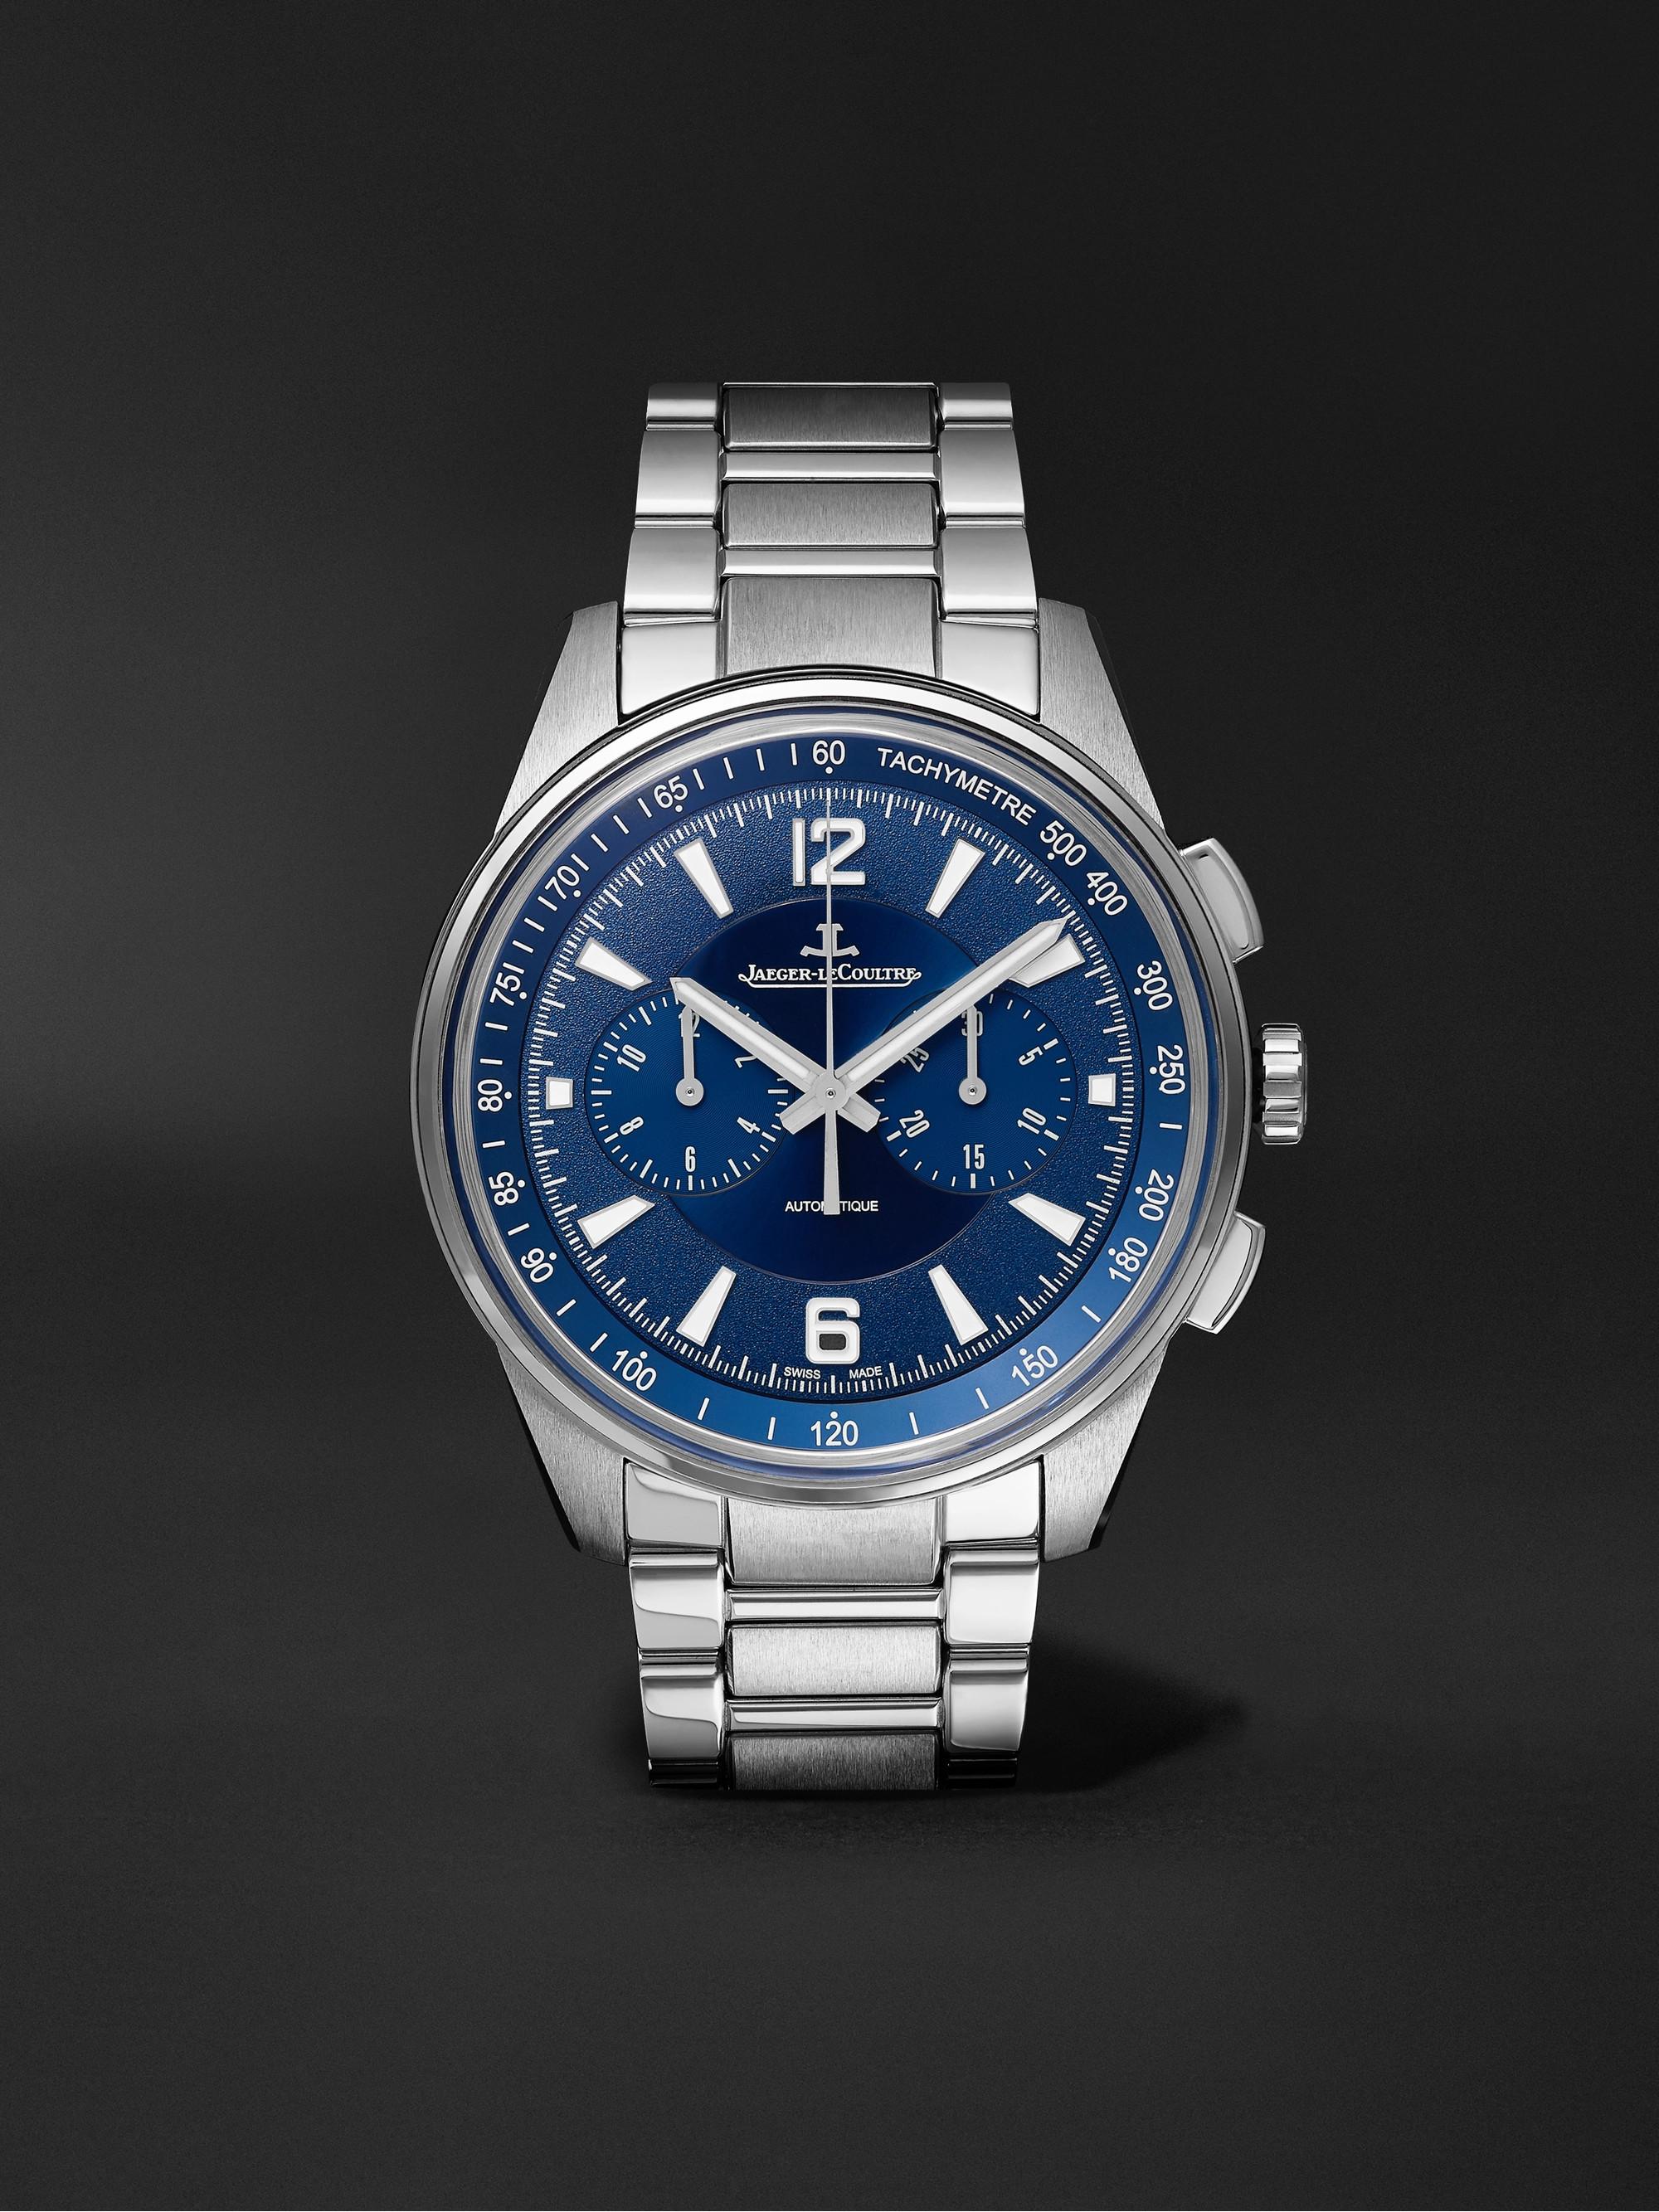 Jaeger-LeCoultre Polaris Automatic Chronograph Ref. No. 9028180